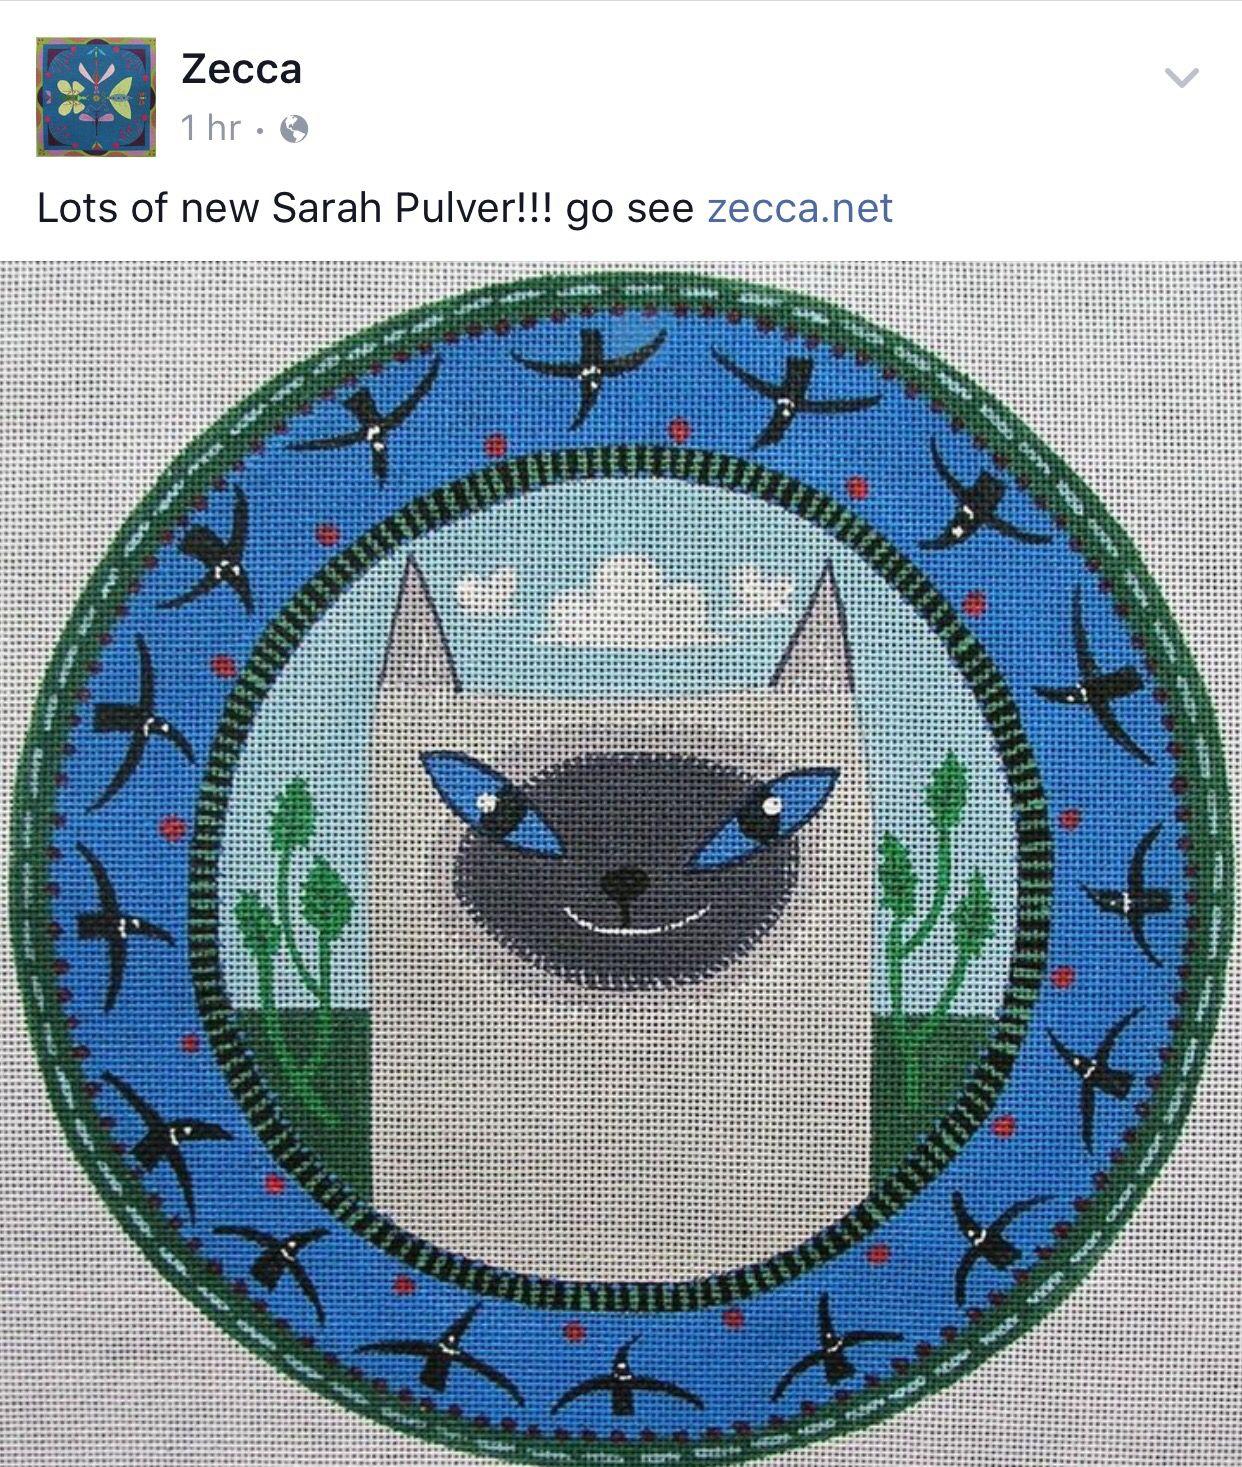 Pin By Sara Abbott On Stitch Decor Pinterest Needlepoint And Stitch